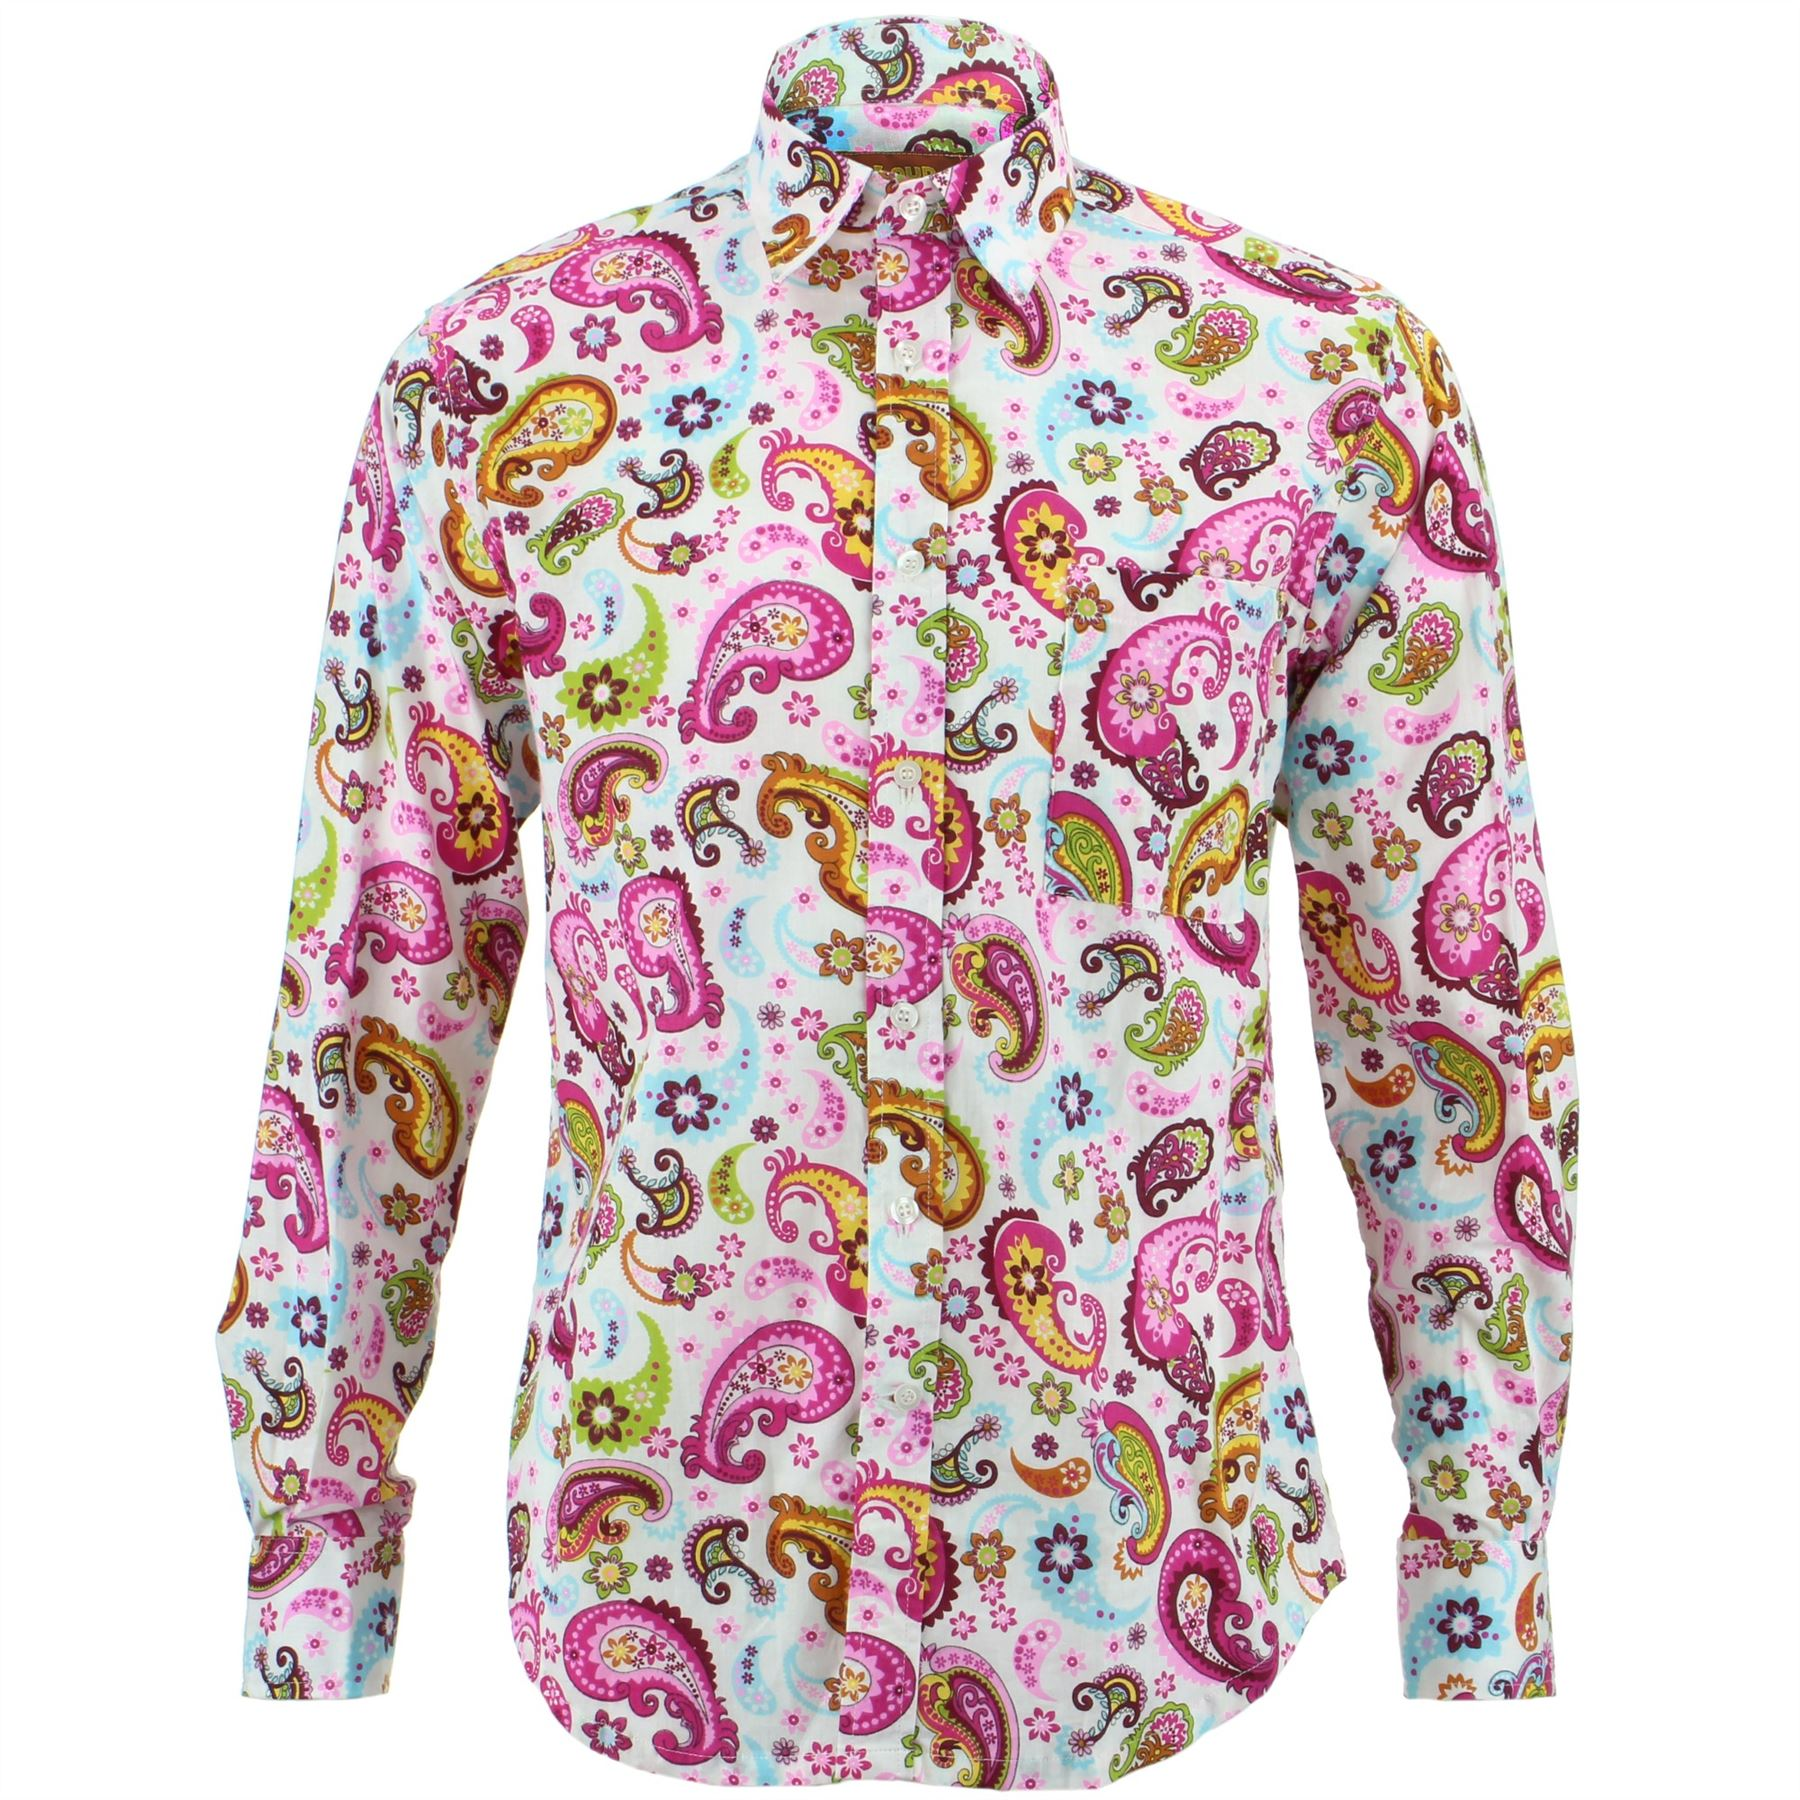 Mens Shirt Loud Originals REGULAR FIT Floral White Retro Psychedelic Fancy